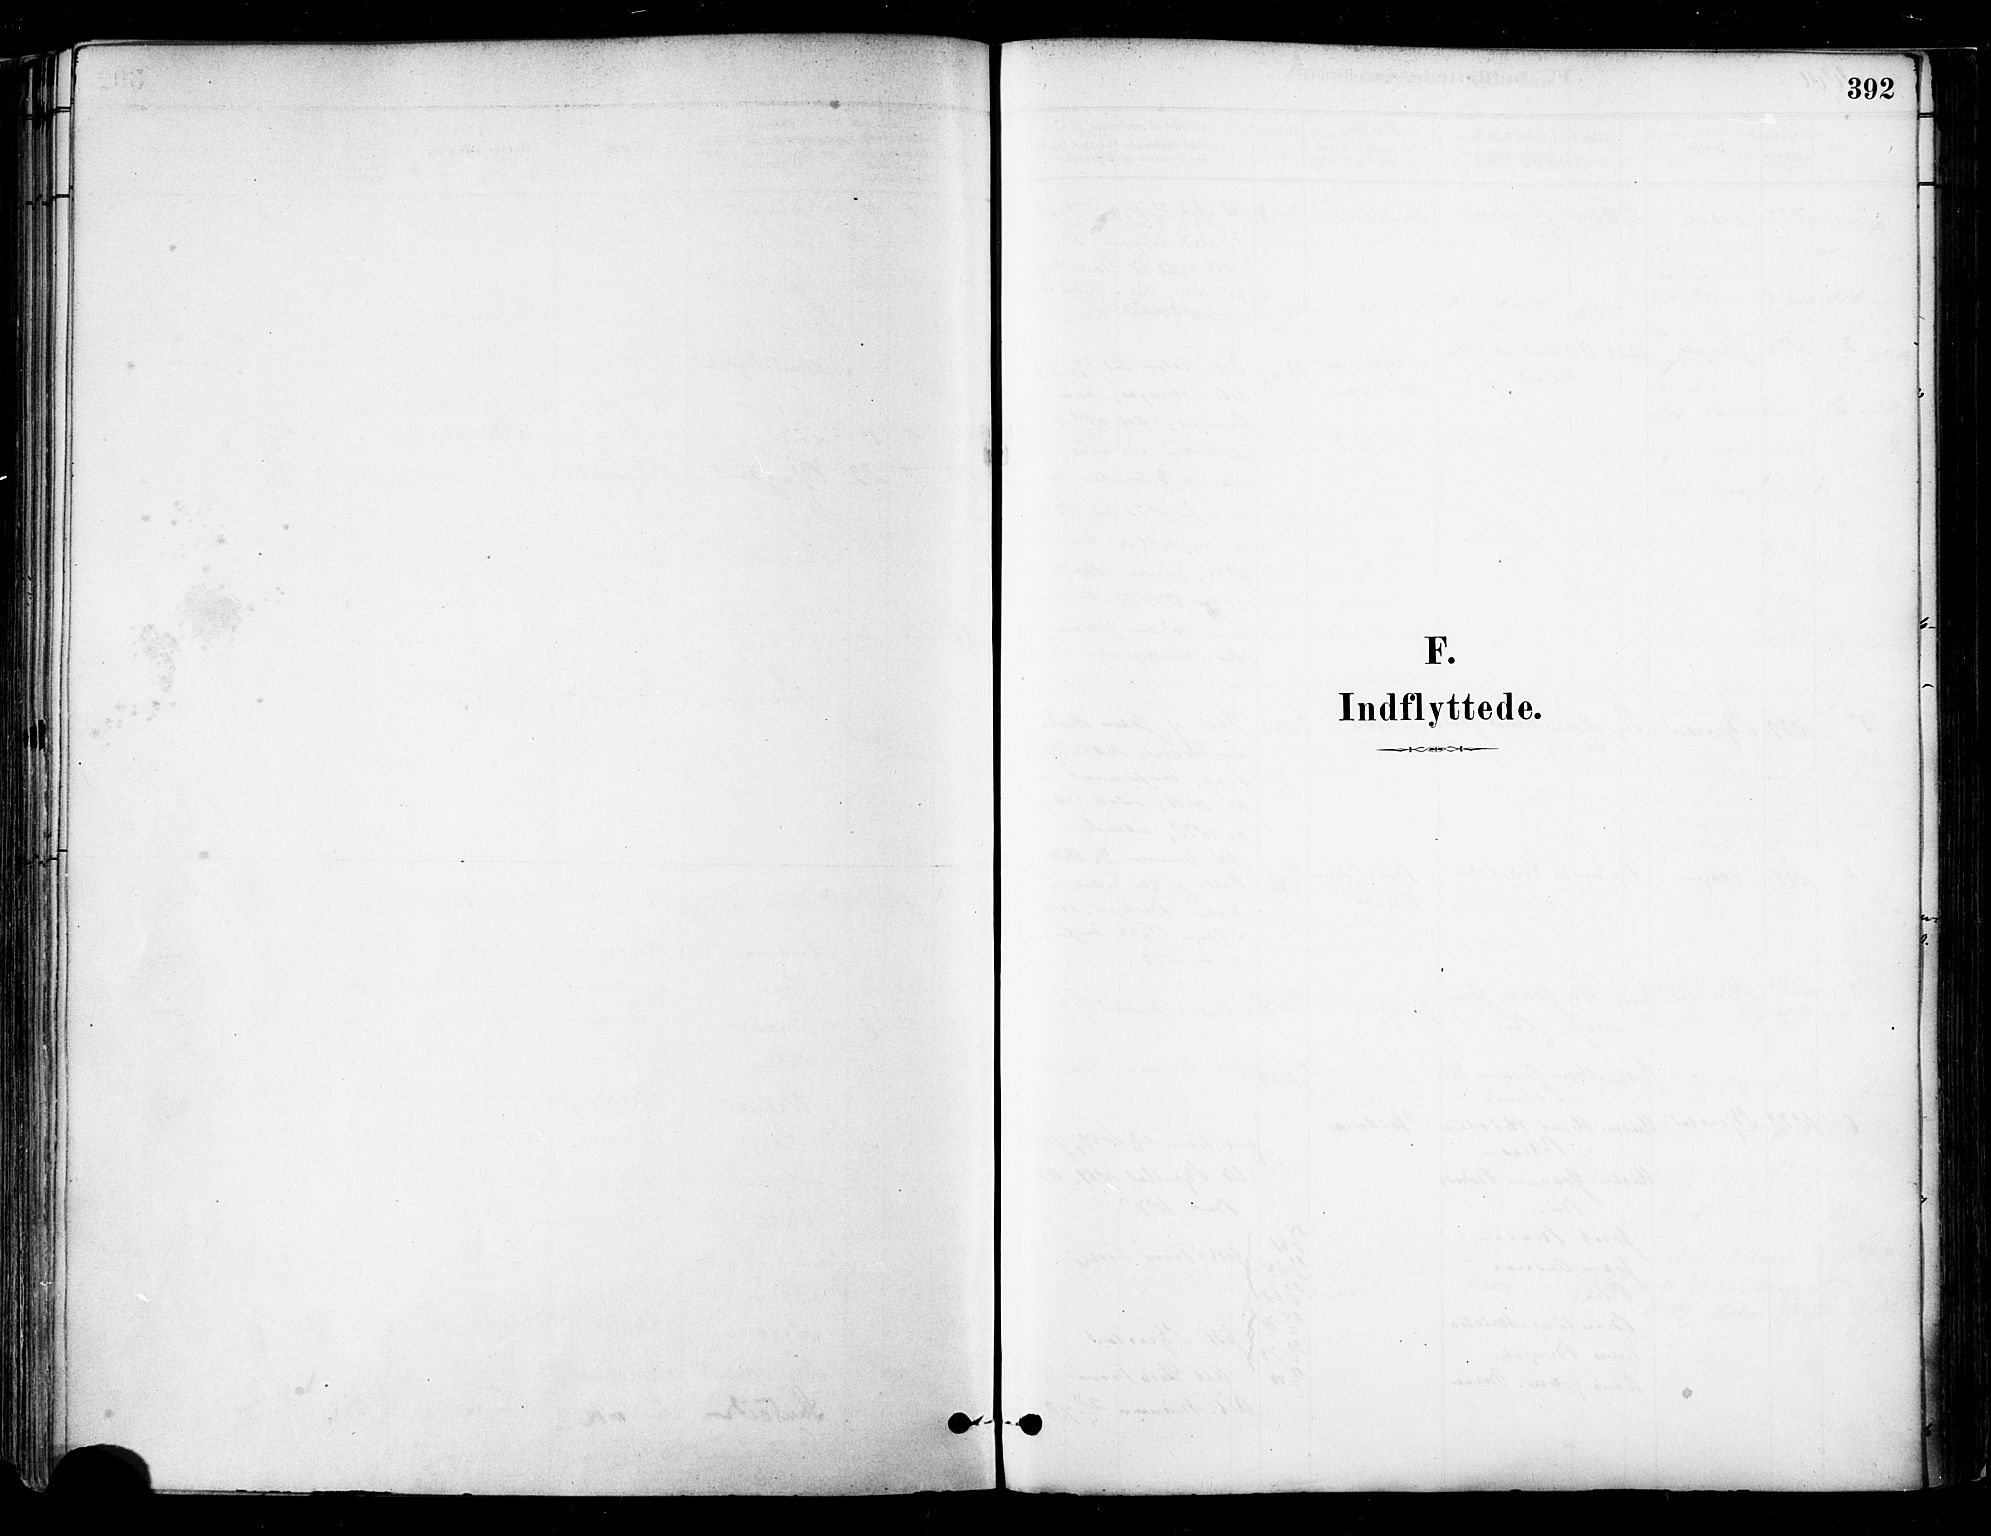 SAT, Ministerialprotokoller, klokkerbøker og fødselsregistre - Nordland, 802/L0054: Ministerialbok nr. 802A01, 1879-1893, s. 392